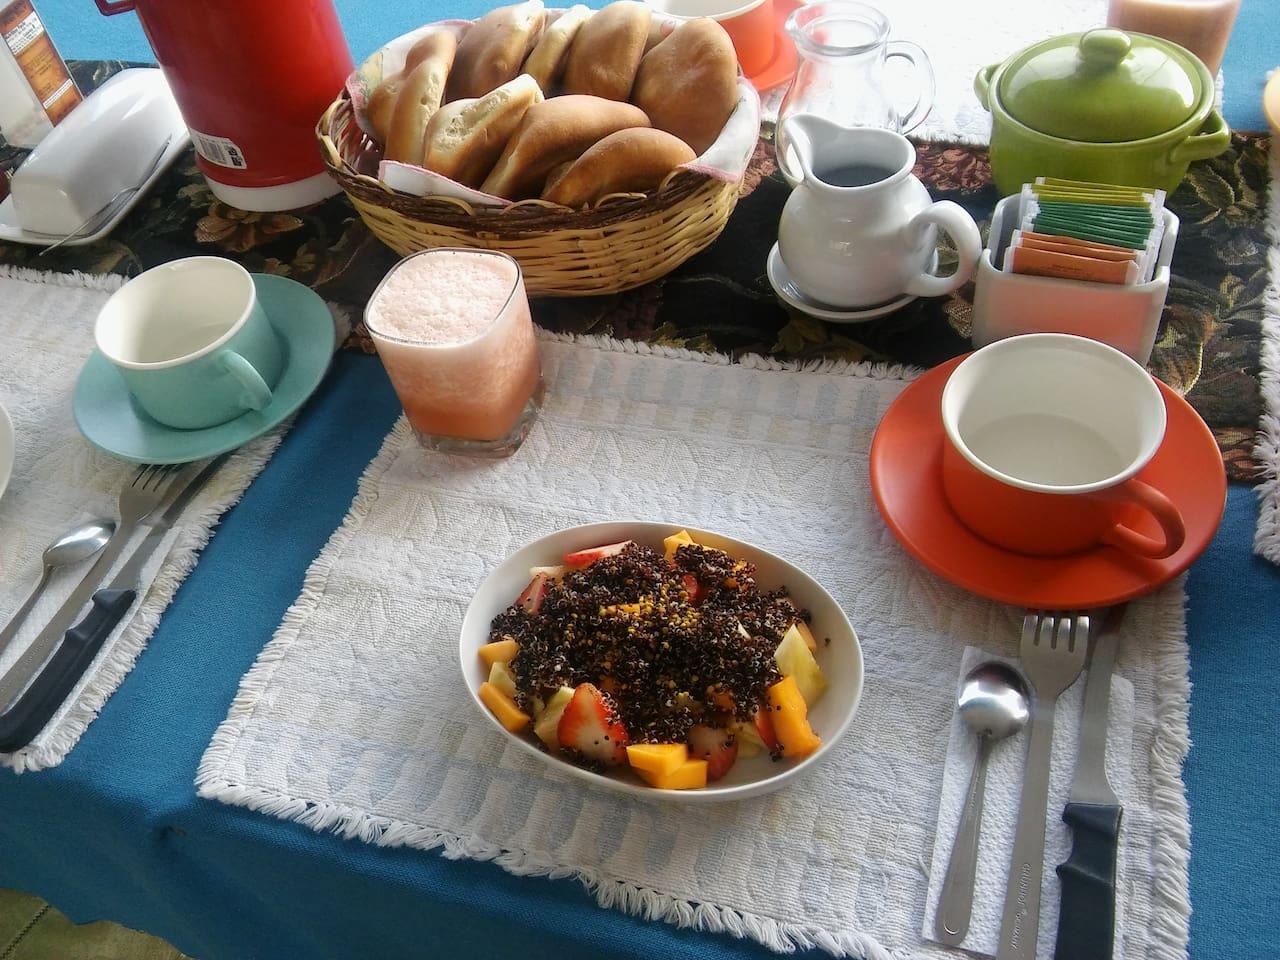 Every day a different homemade breakfast! / Cada día un desayuno casero diferente!